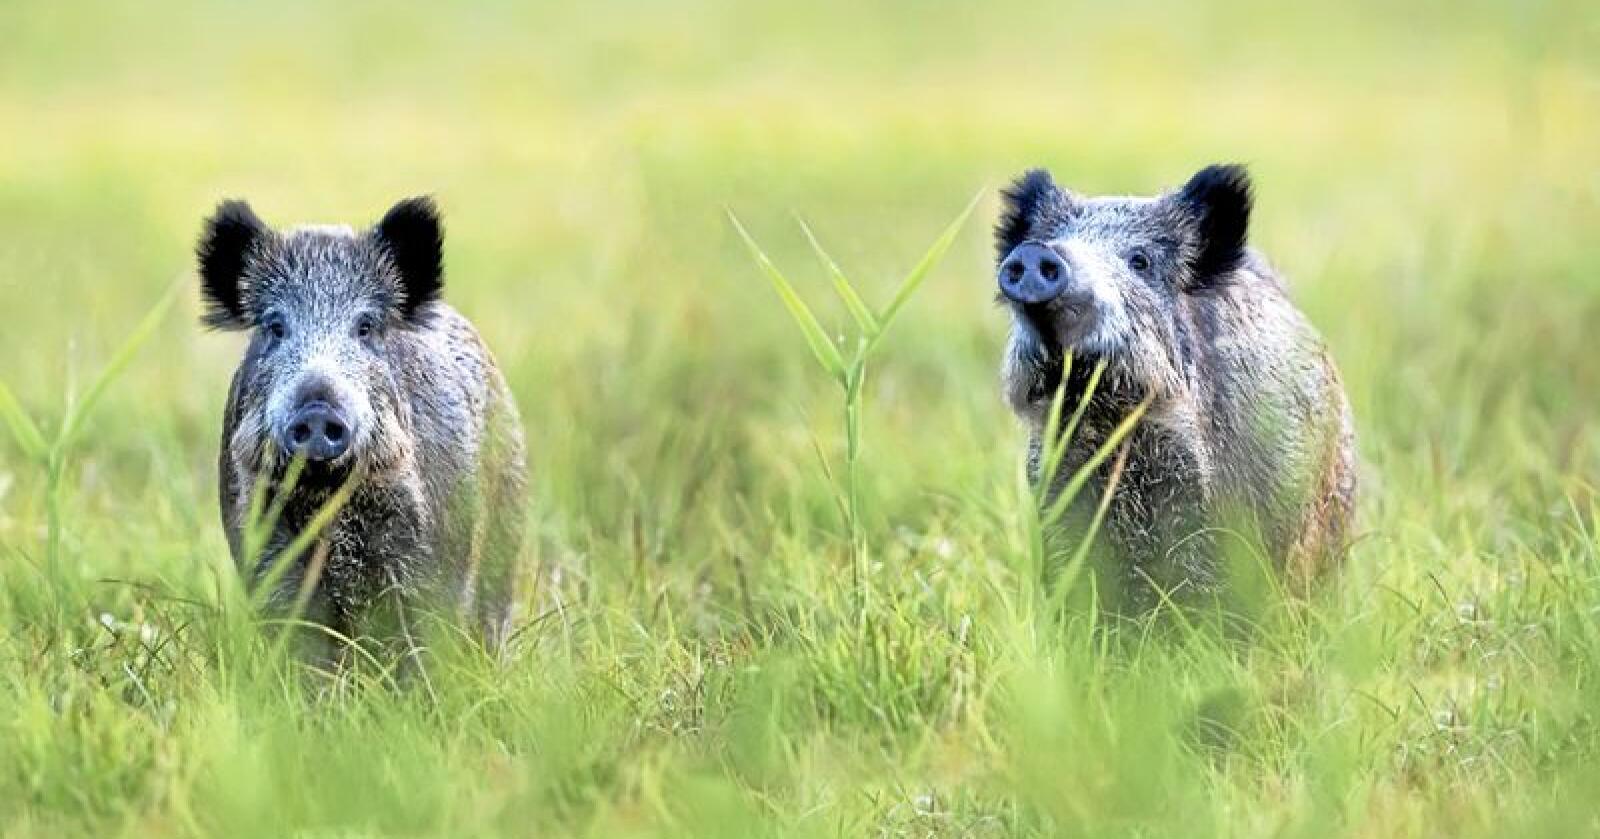 Rekordmange villsvin ble skutt i Sverige i fjor. Foto: Mostphotos